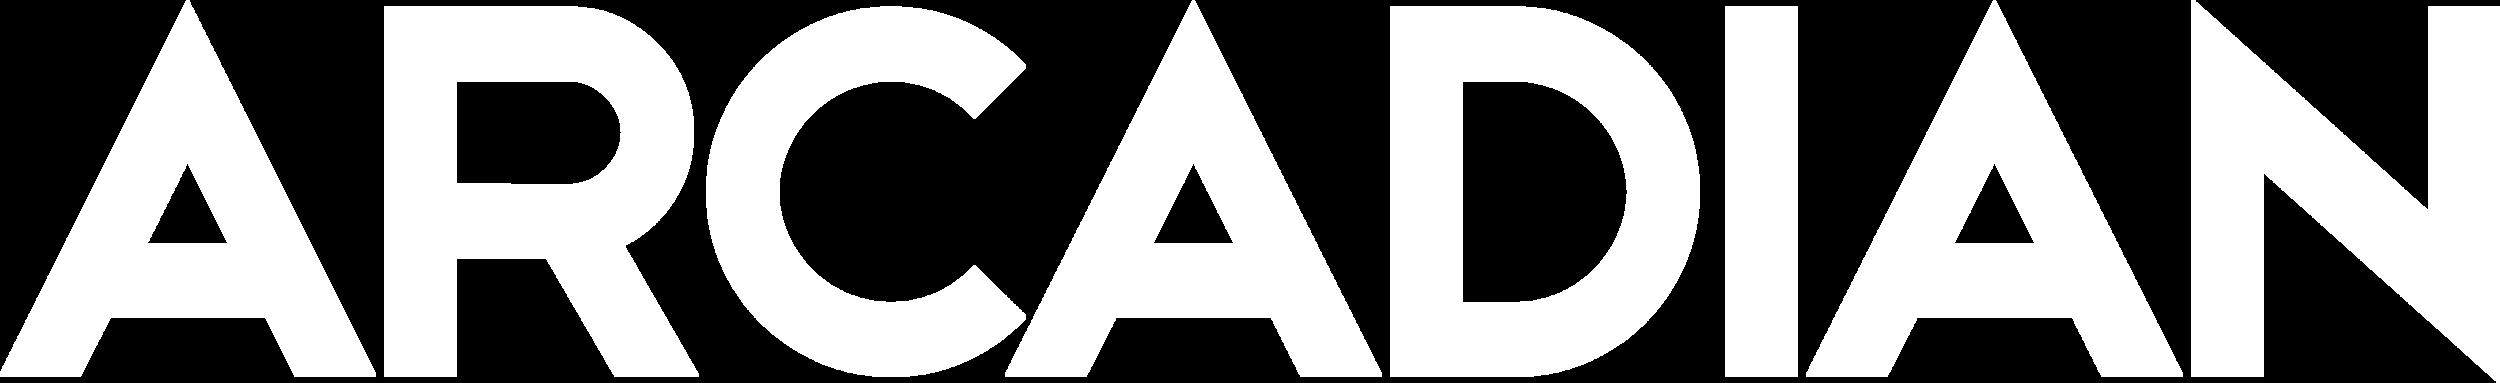 Arcadian_Logo_White_a9268532-ca73-4d65-8a70-15d78d20d7a4.png